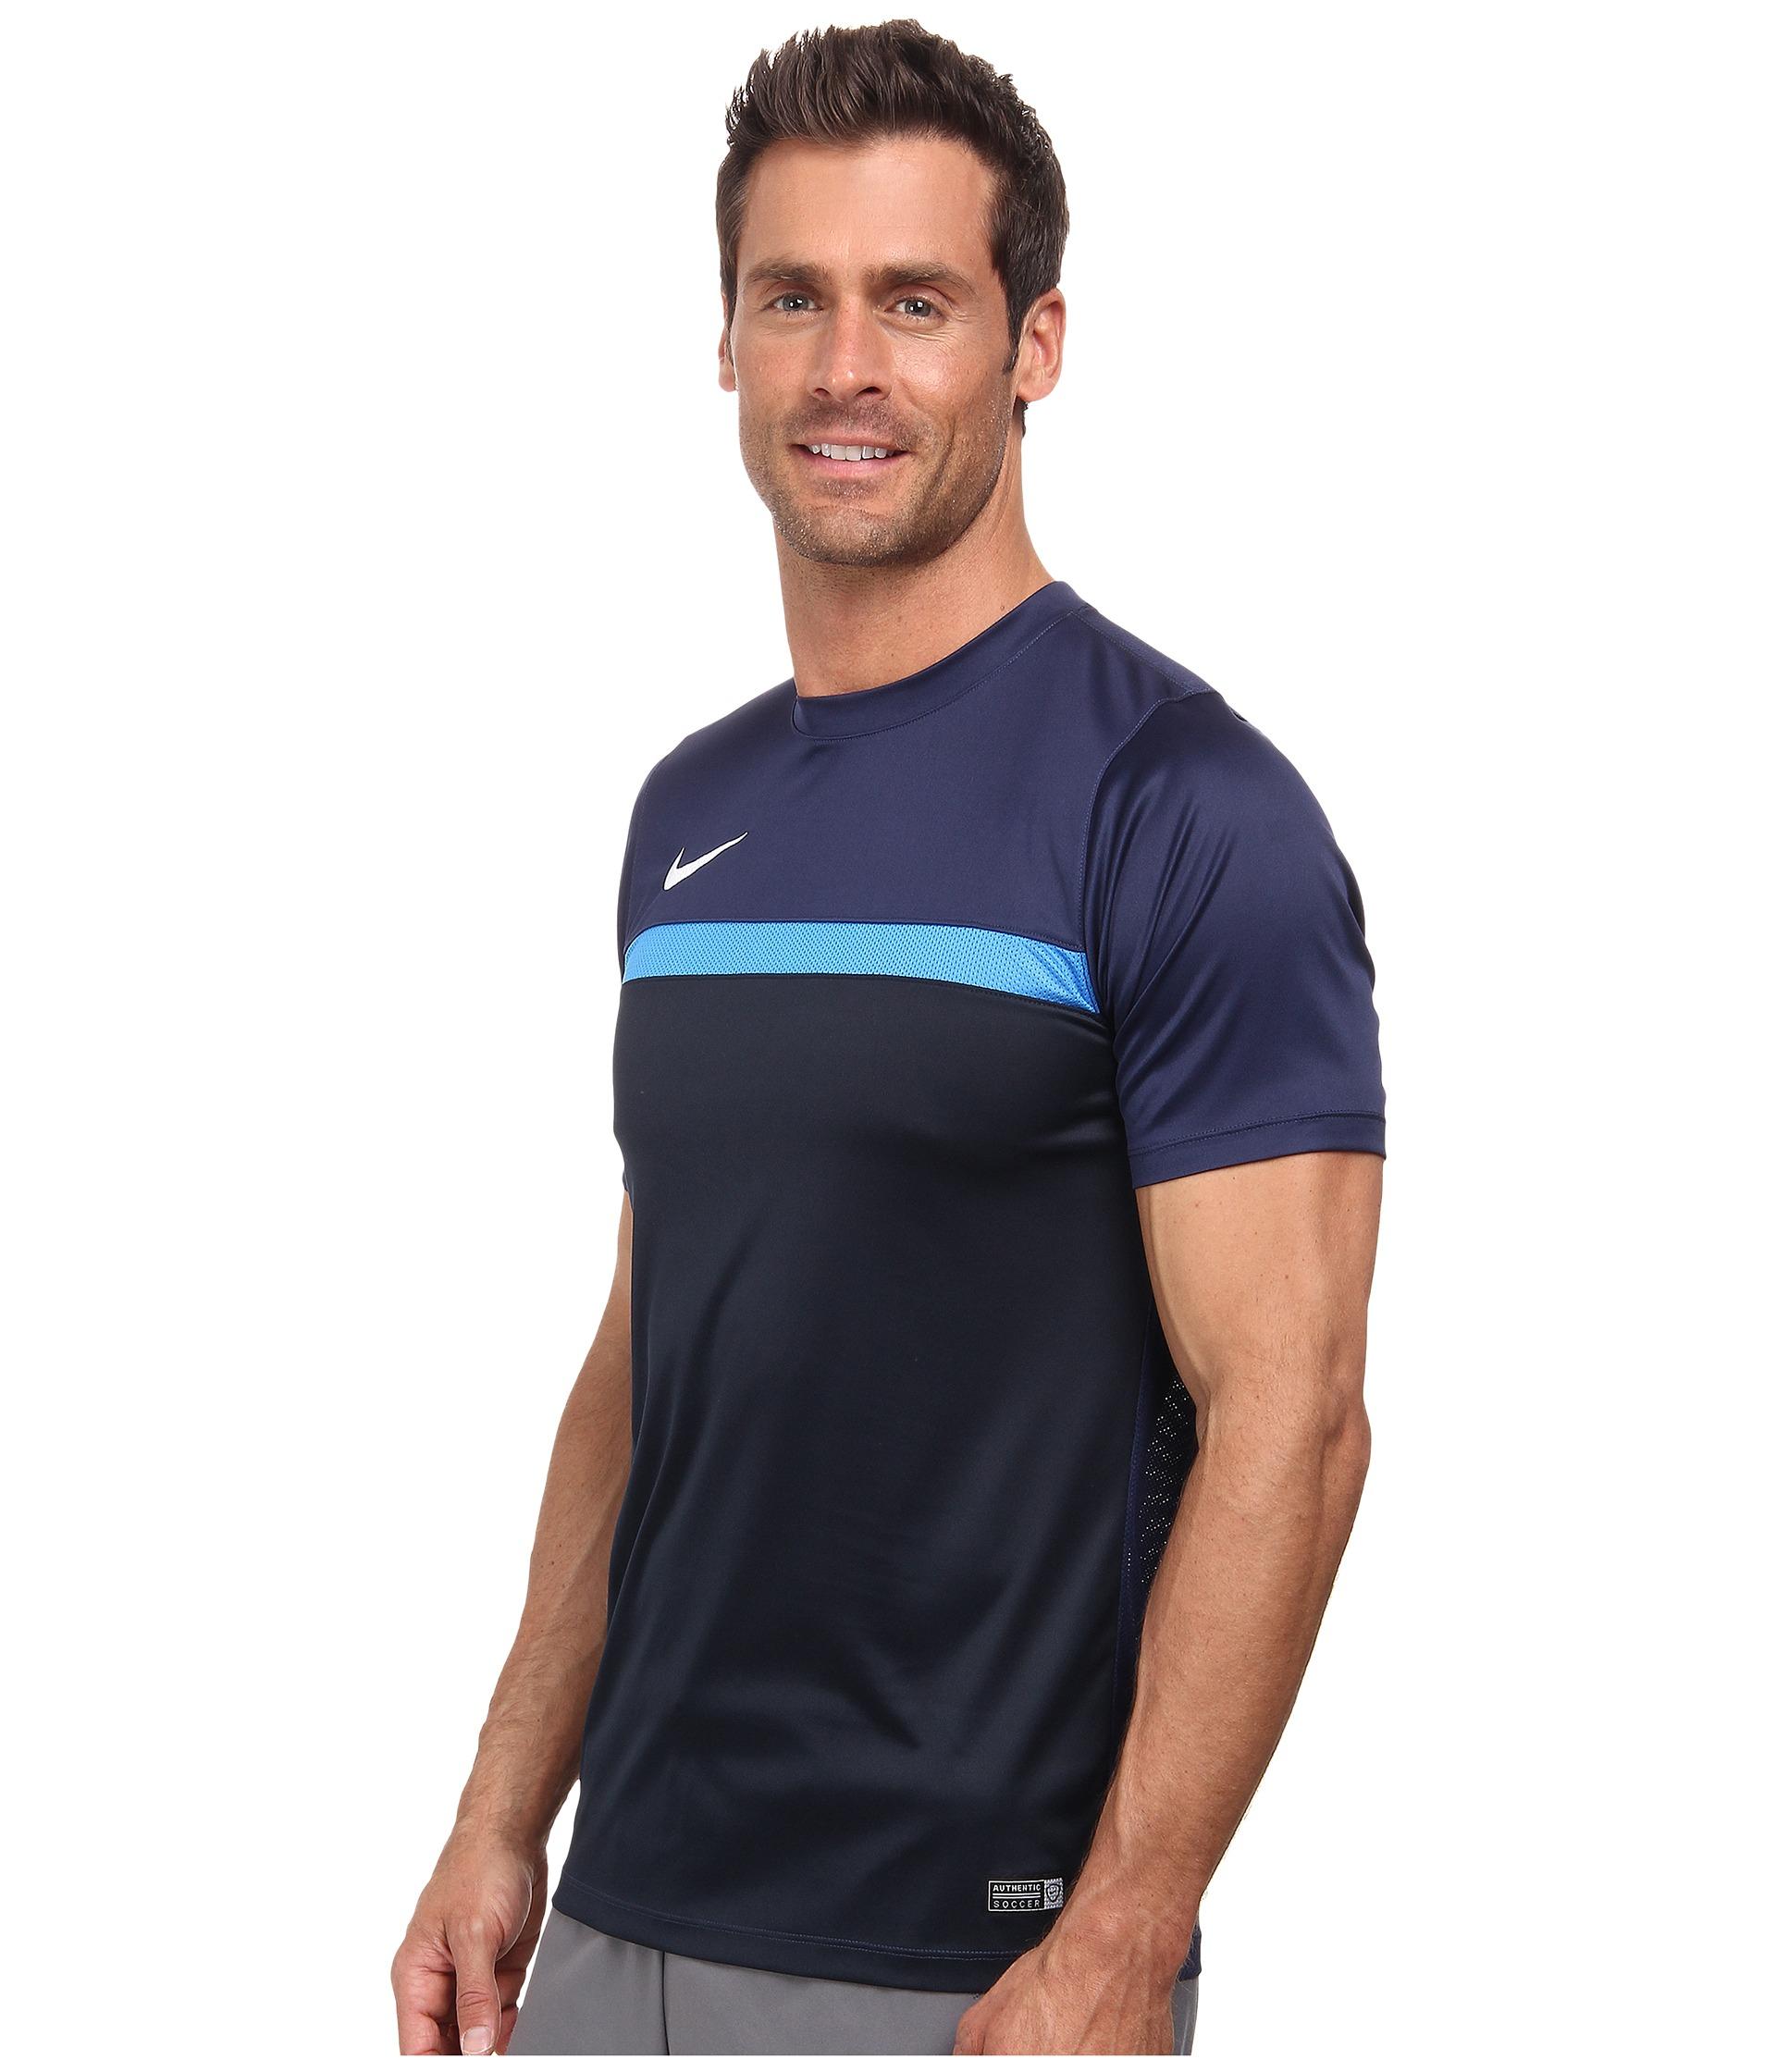 1e9144bdd Nike Academy S/s Training Top 1 in Blue for Men - Lyst